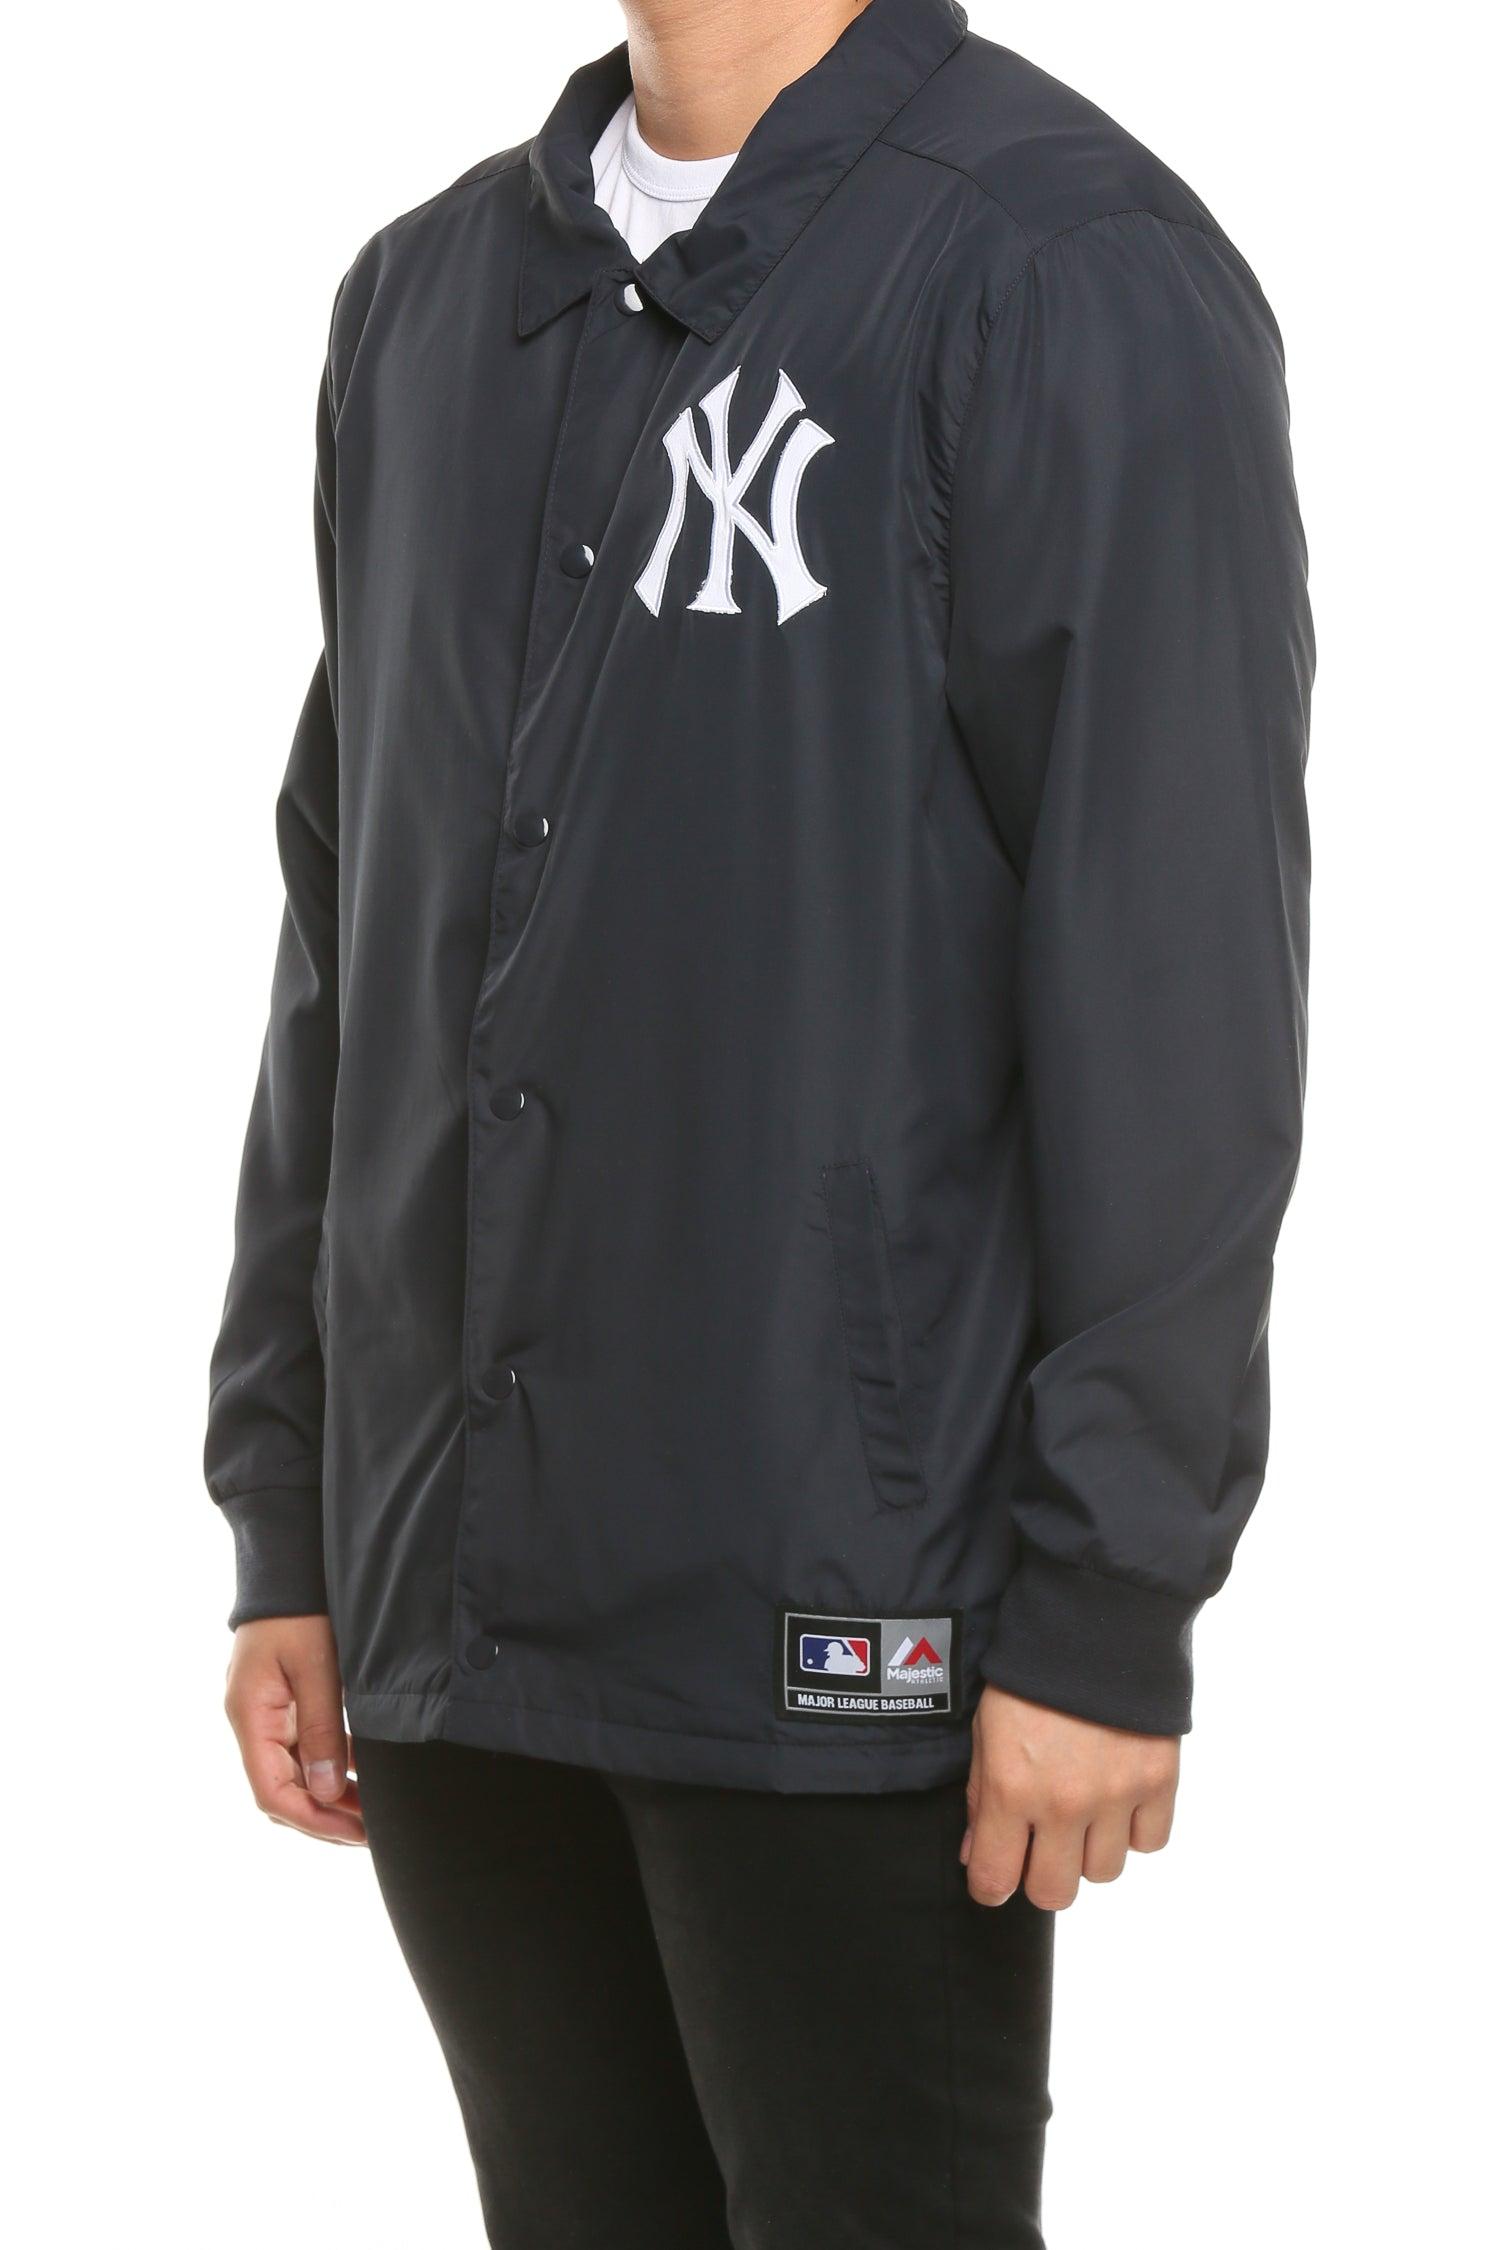 Majestic Athletic Boys Grey /& Navy New York Yankees Jacket